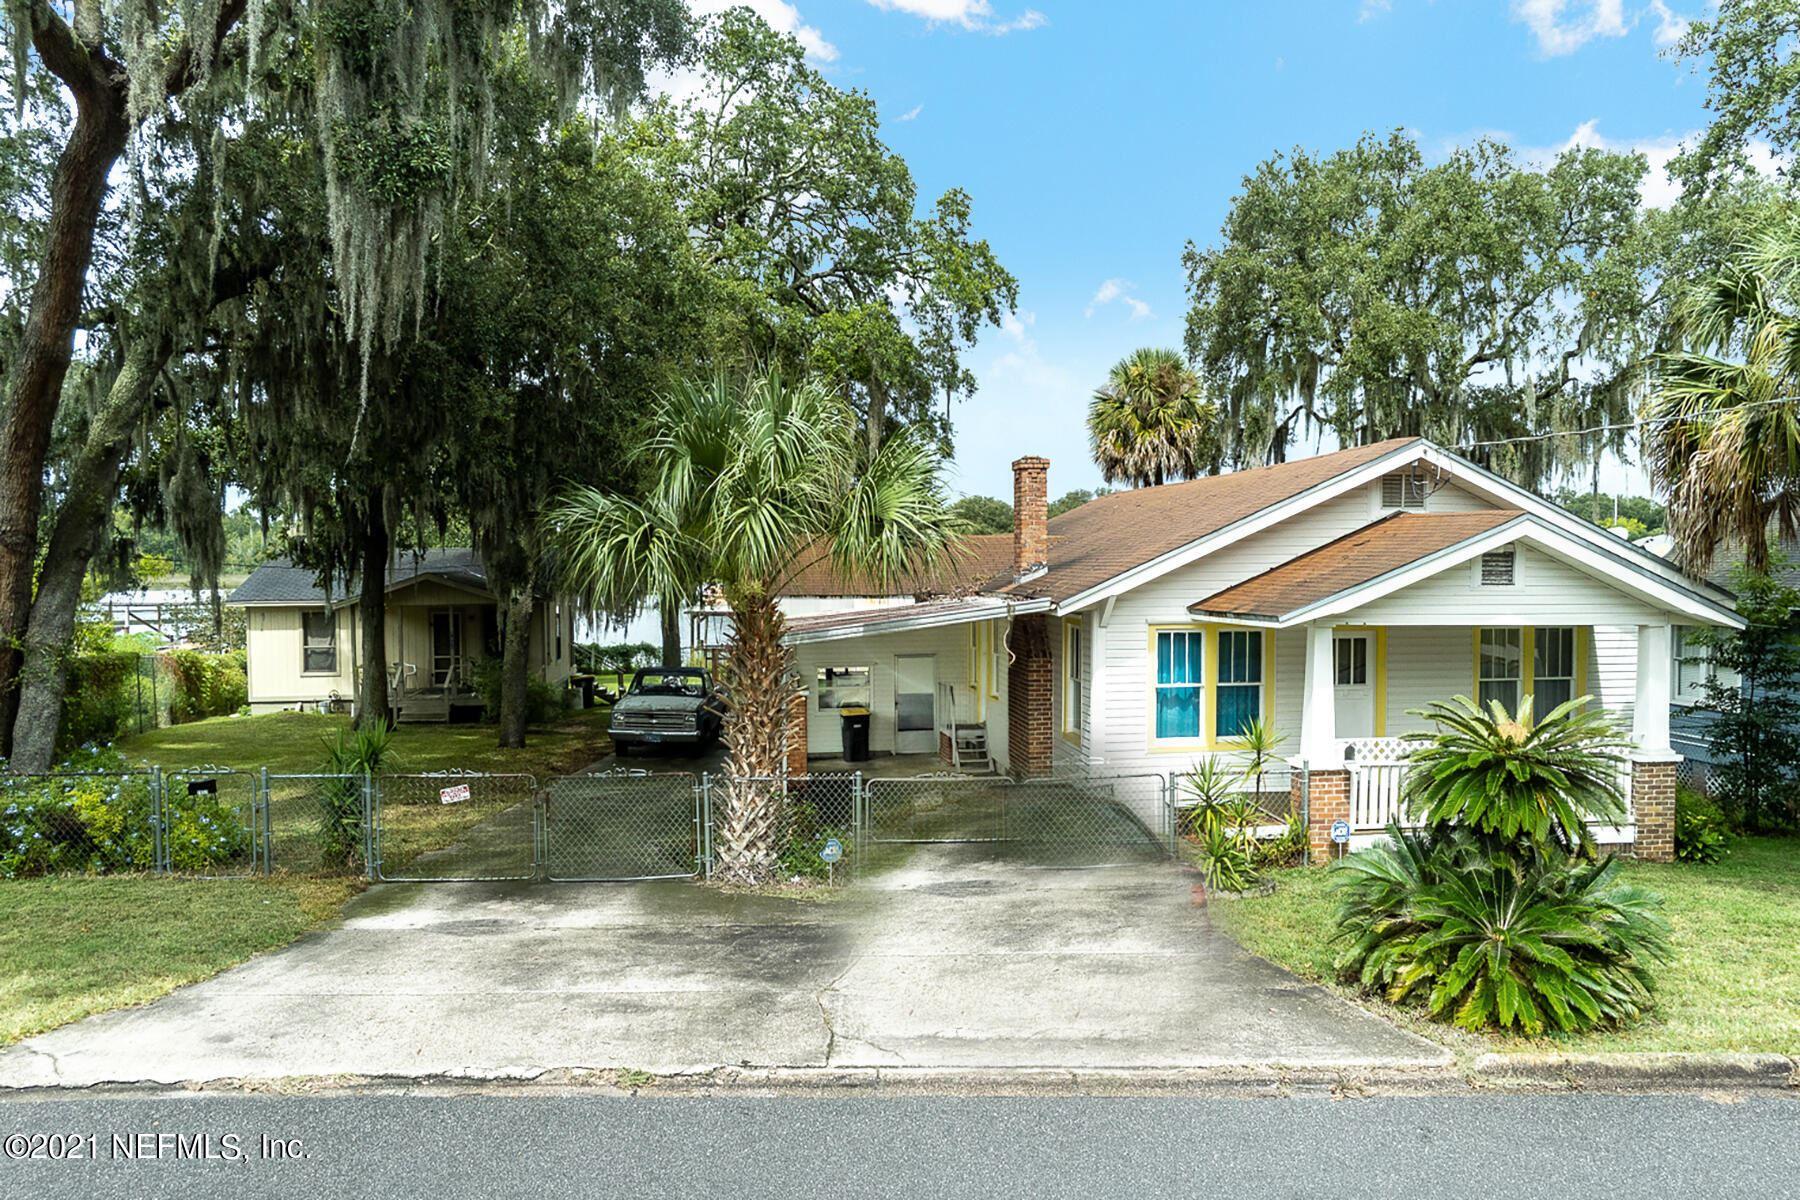 7658 NORTH SHORE DR, Jacksonville, FL 32208 - MLS#: 1131991